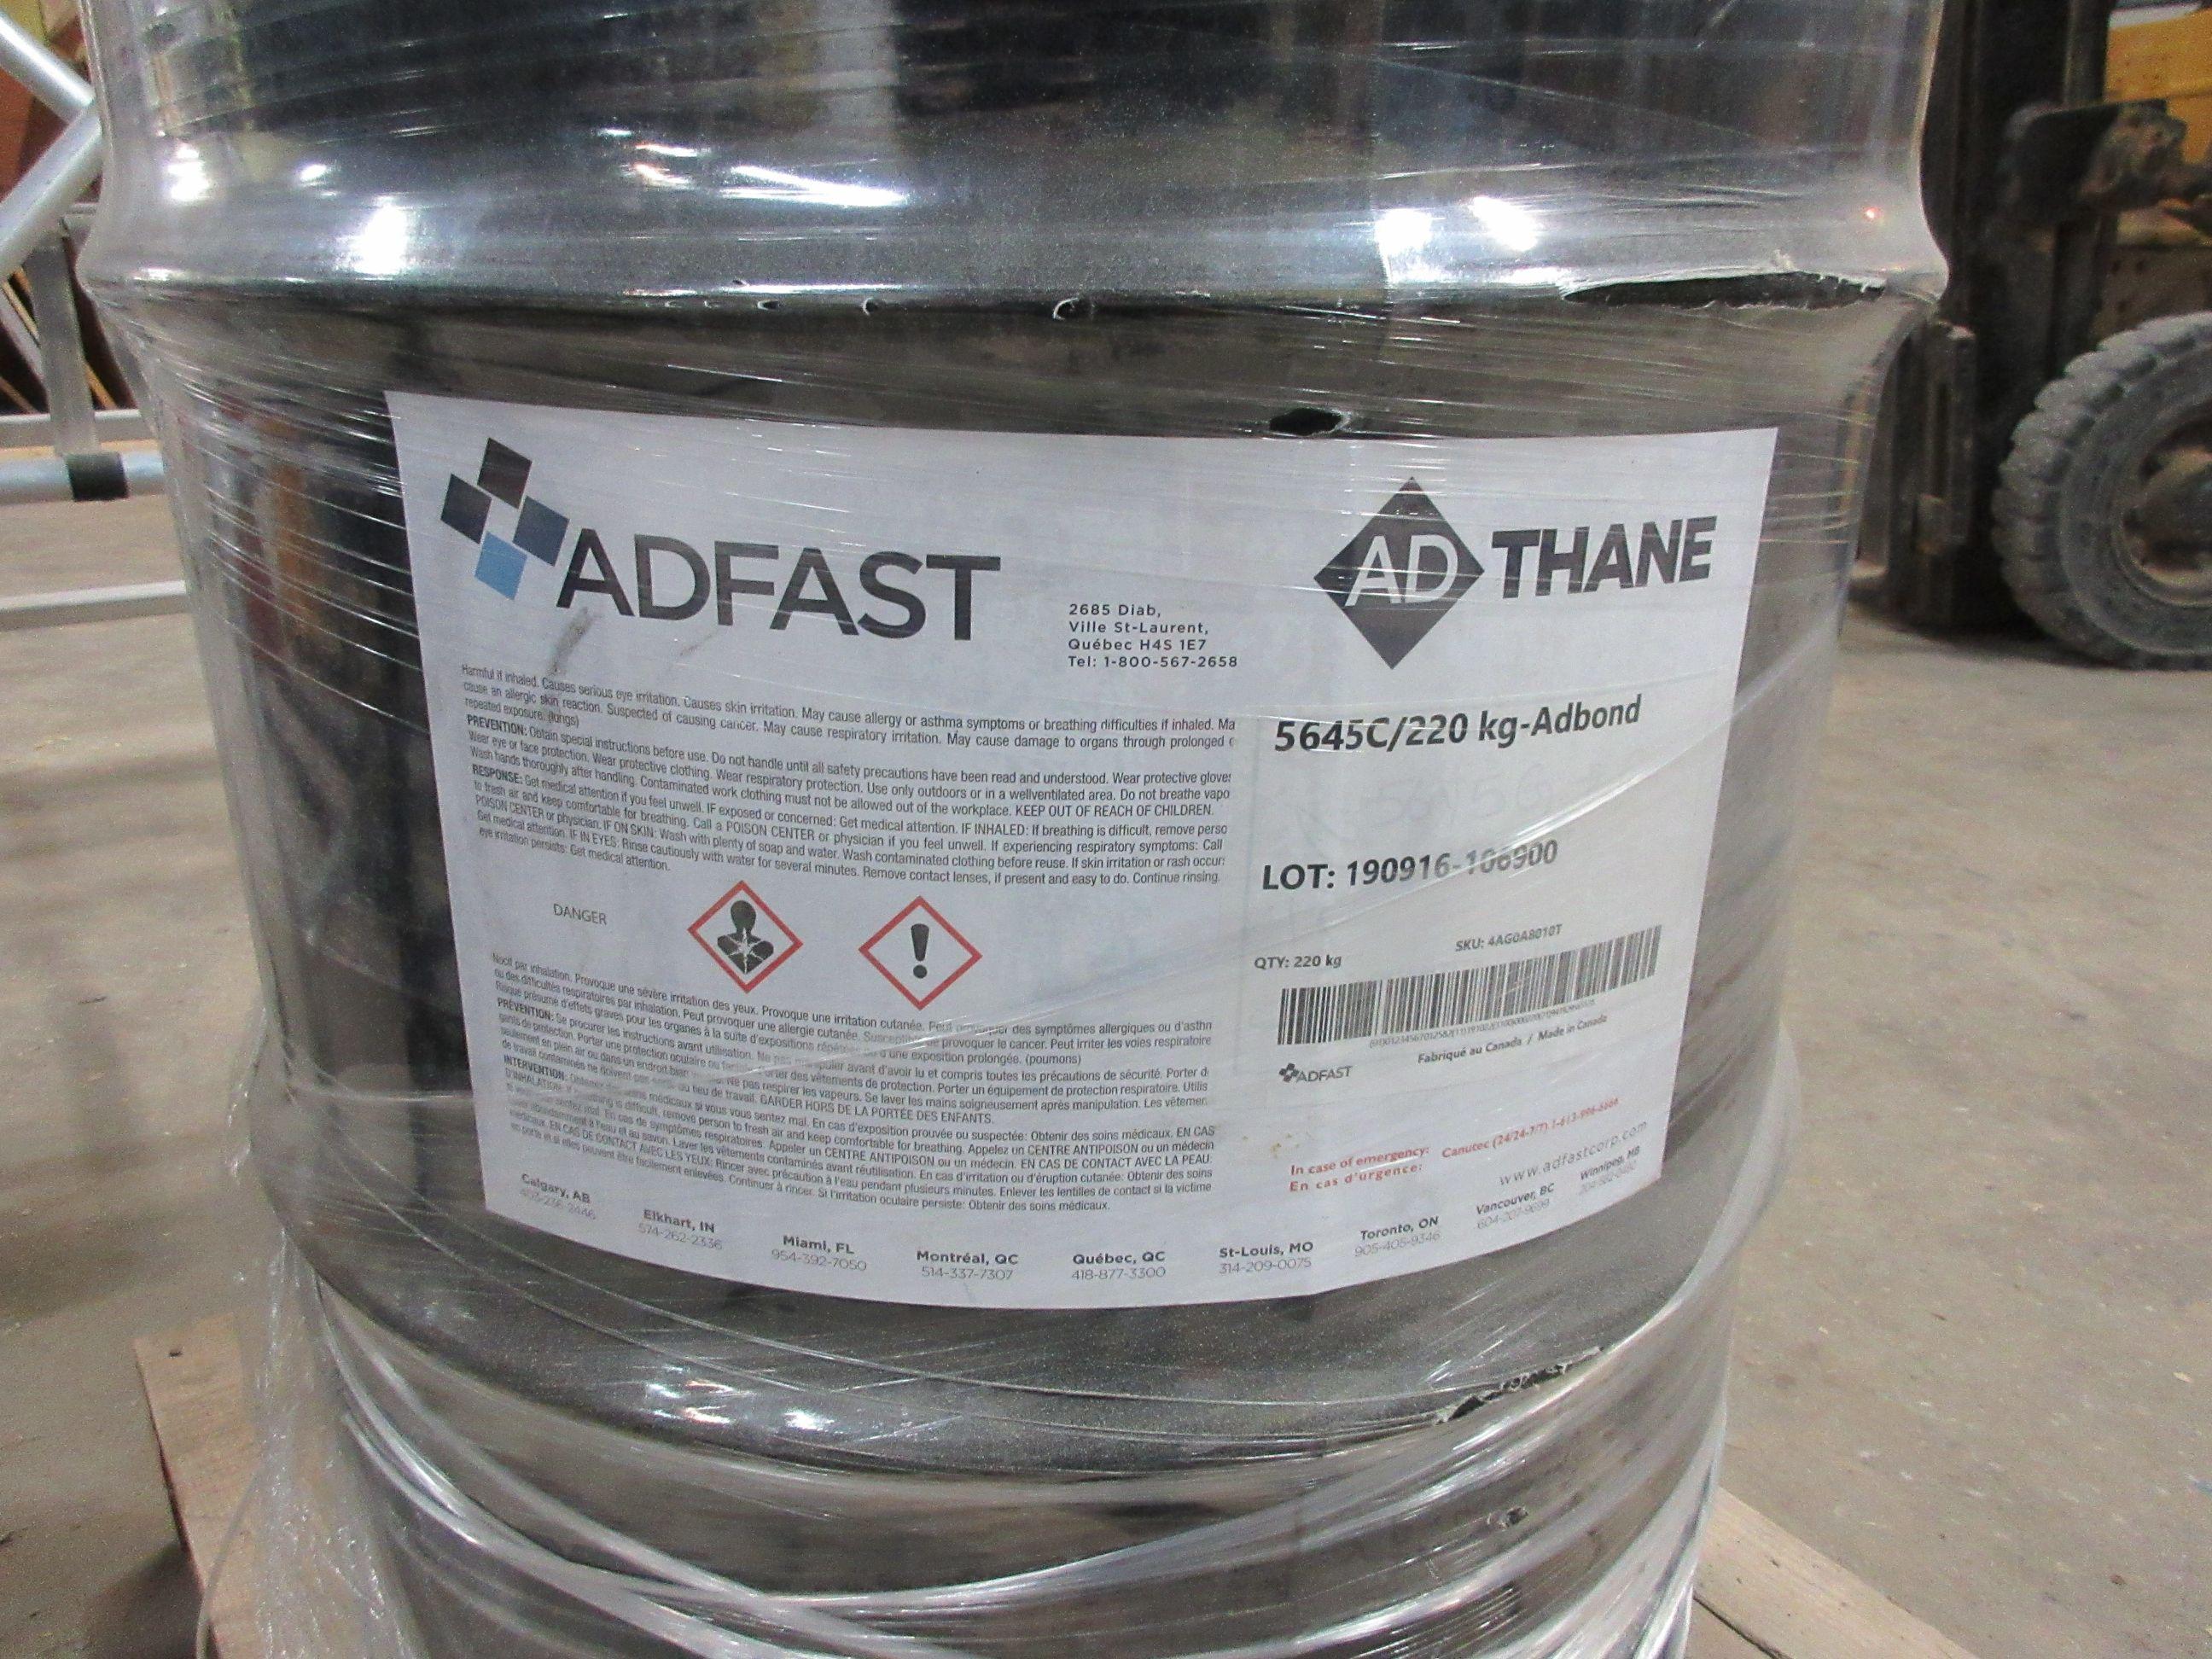 ADFAST 220 KG, adbond - Image 2 of 2